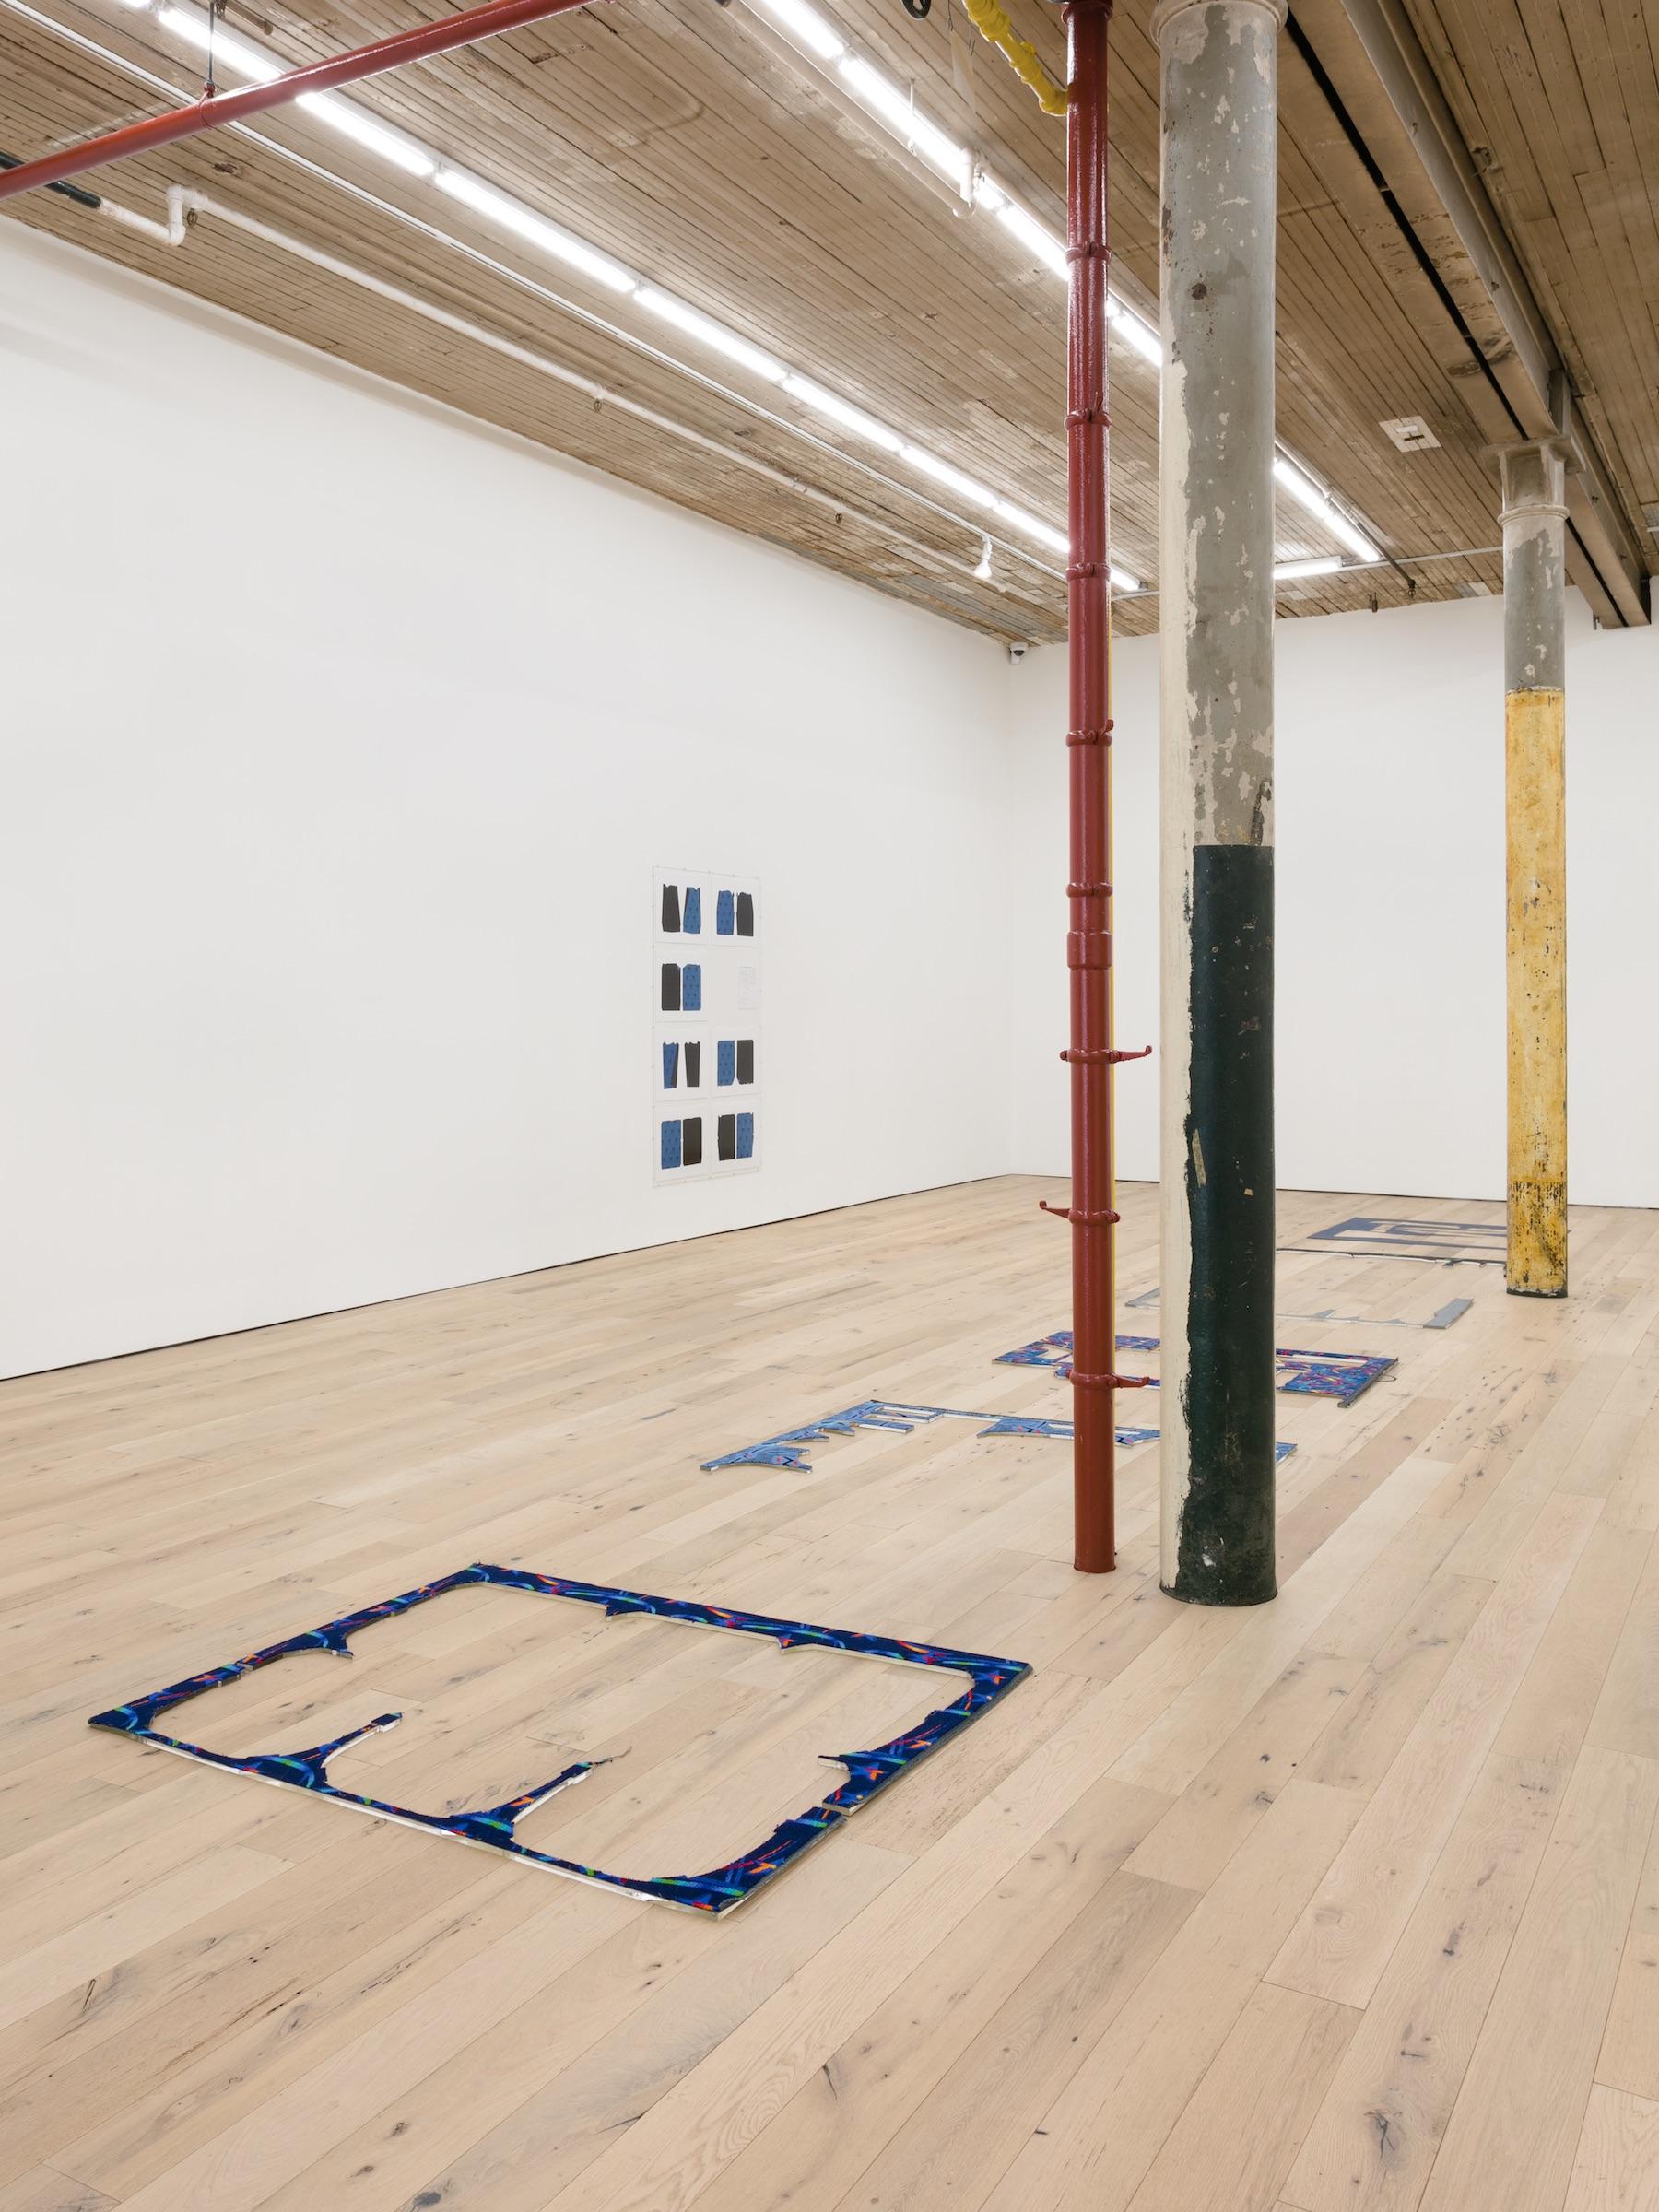 Installation view,  Receipt of a Form, Martos Gallery, New York, 2017